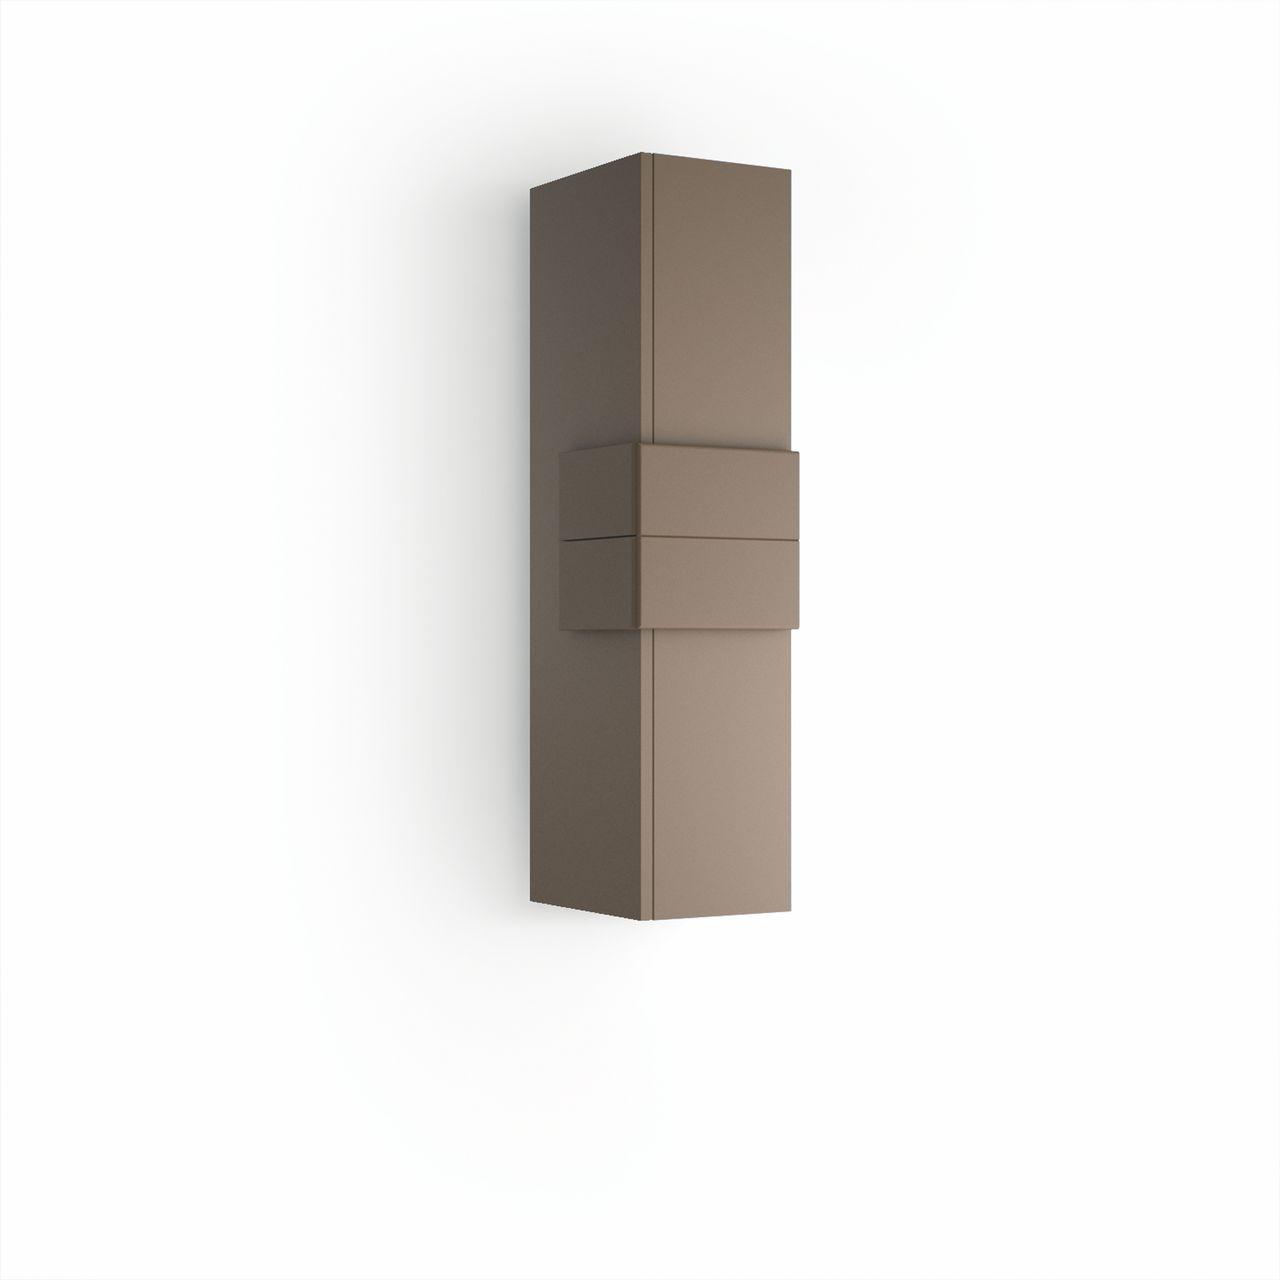 Muebles Cronos halfhoge badkamerkast 100cm mokka - mokka